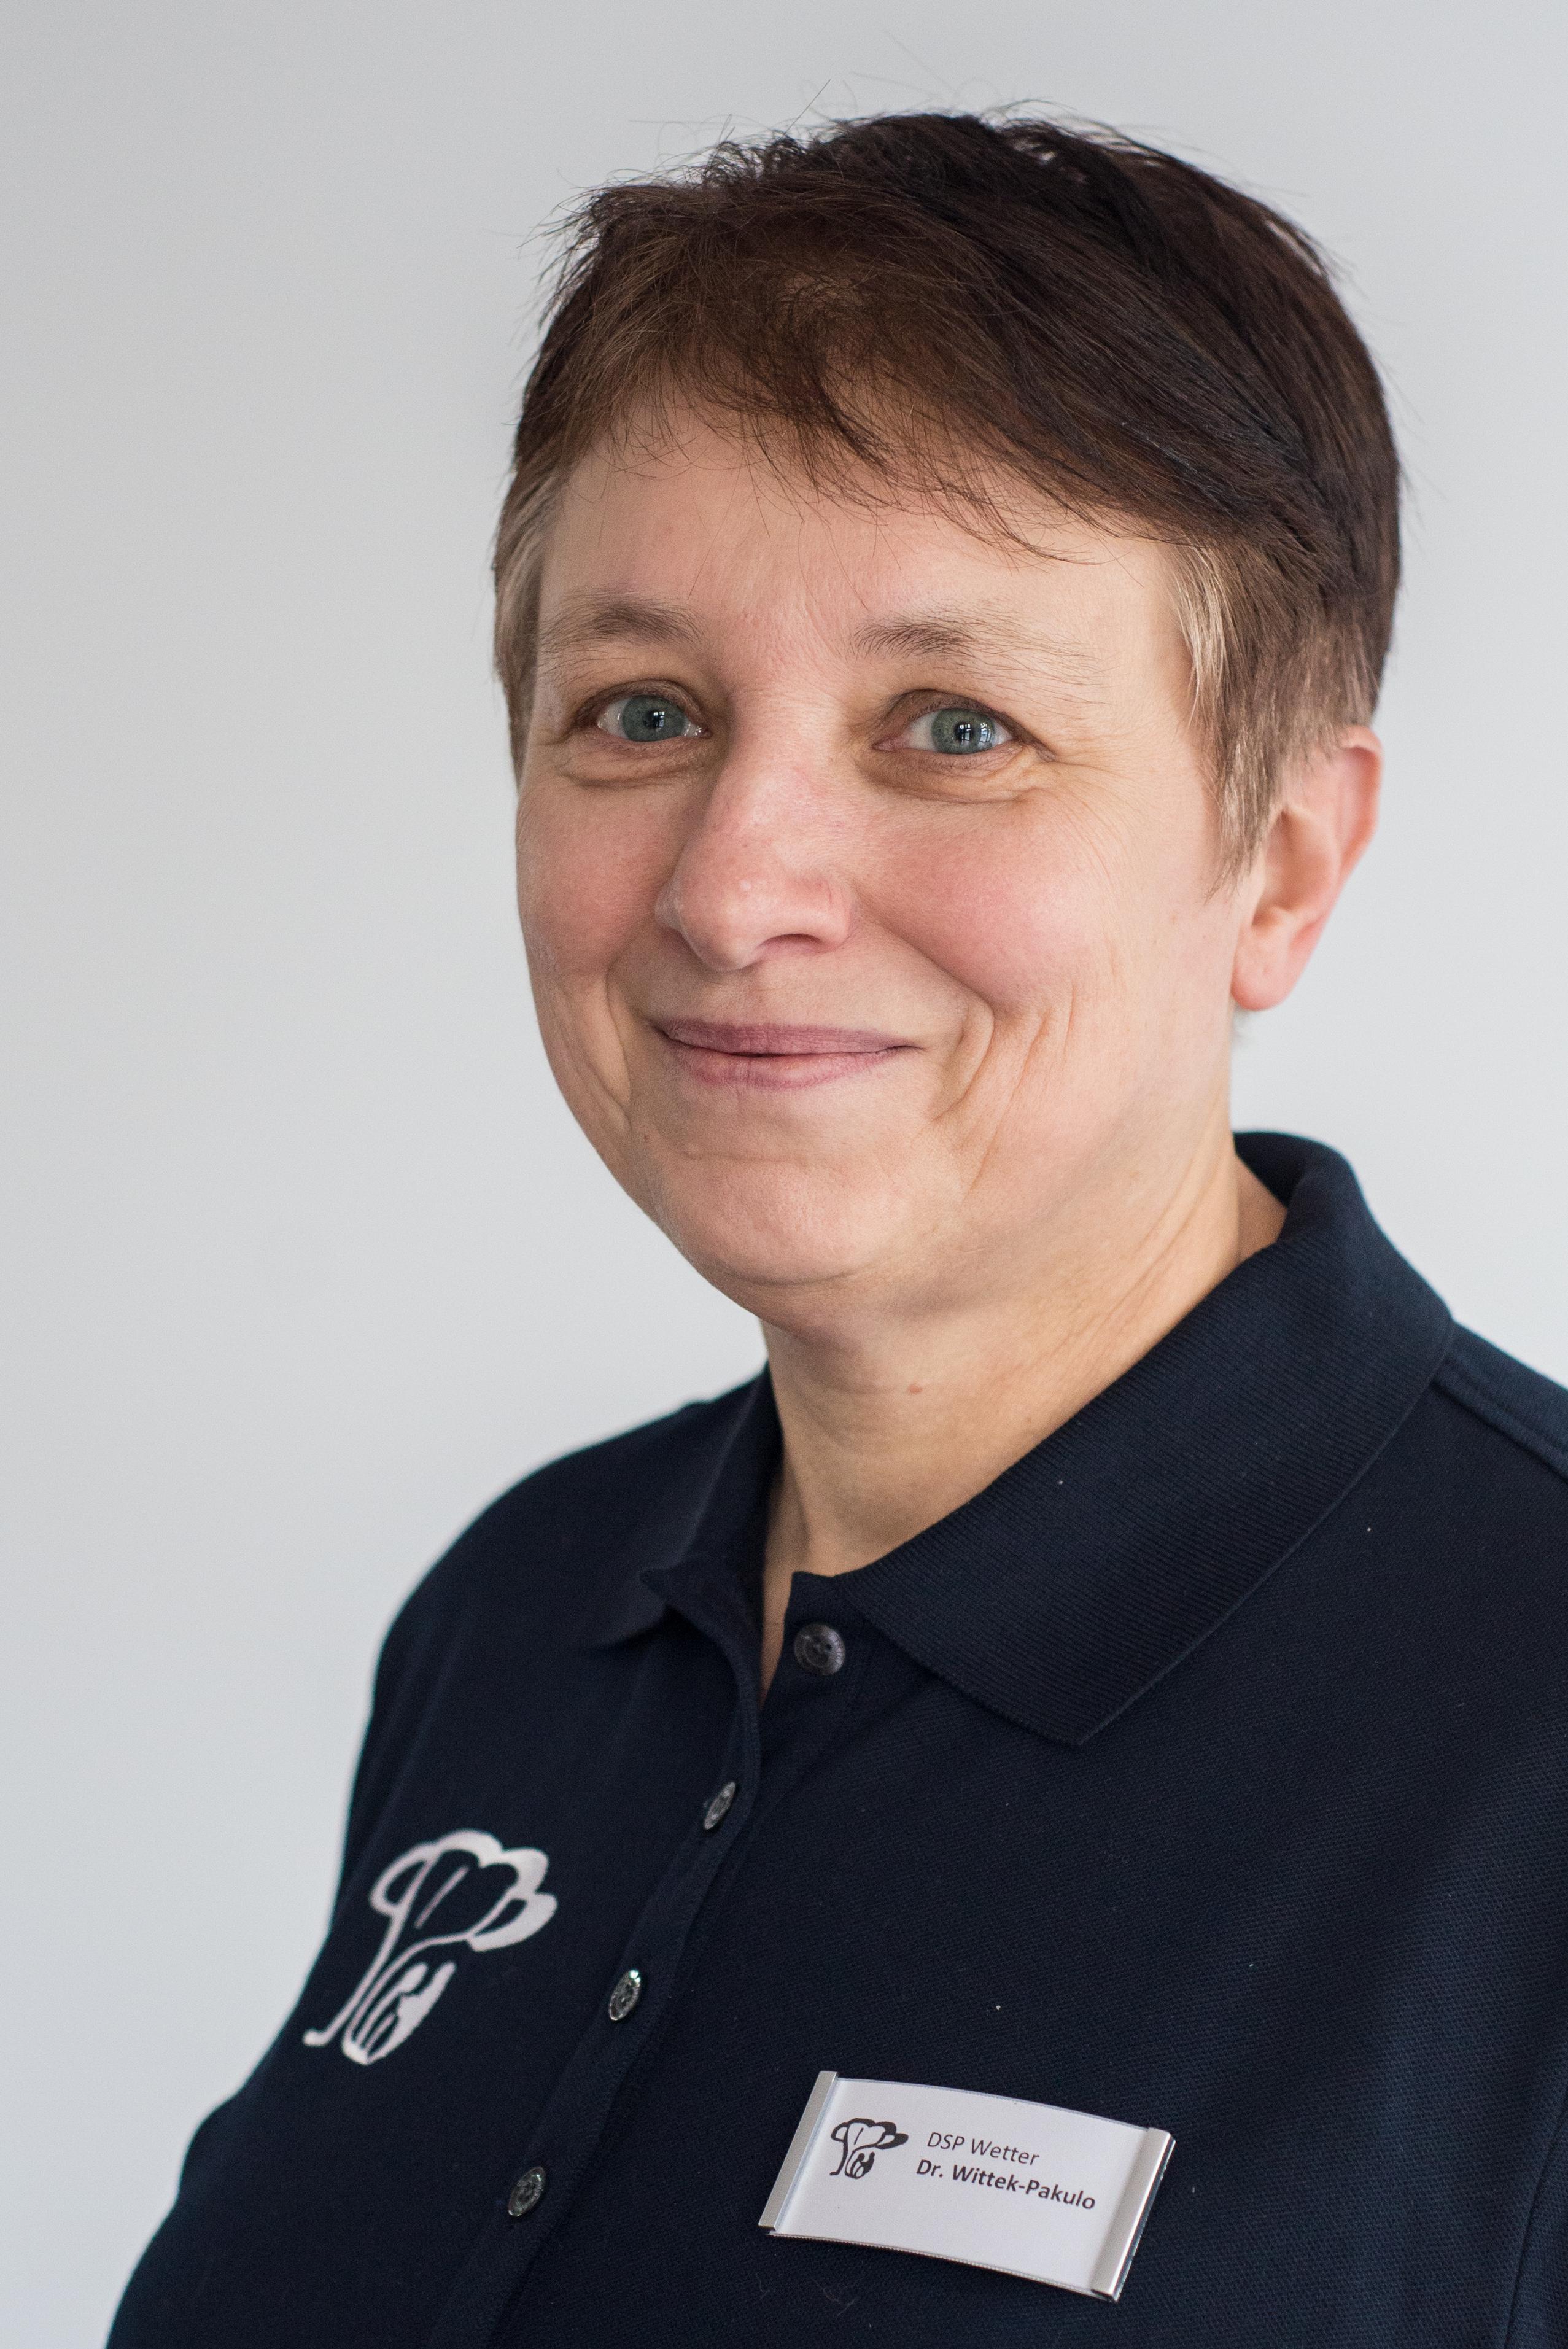 Jolante Wittek-Pakulo MD (PL)